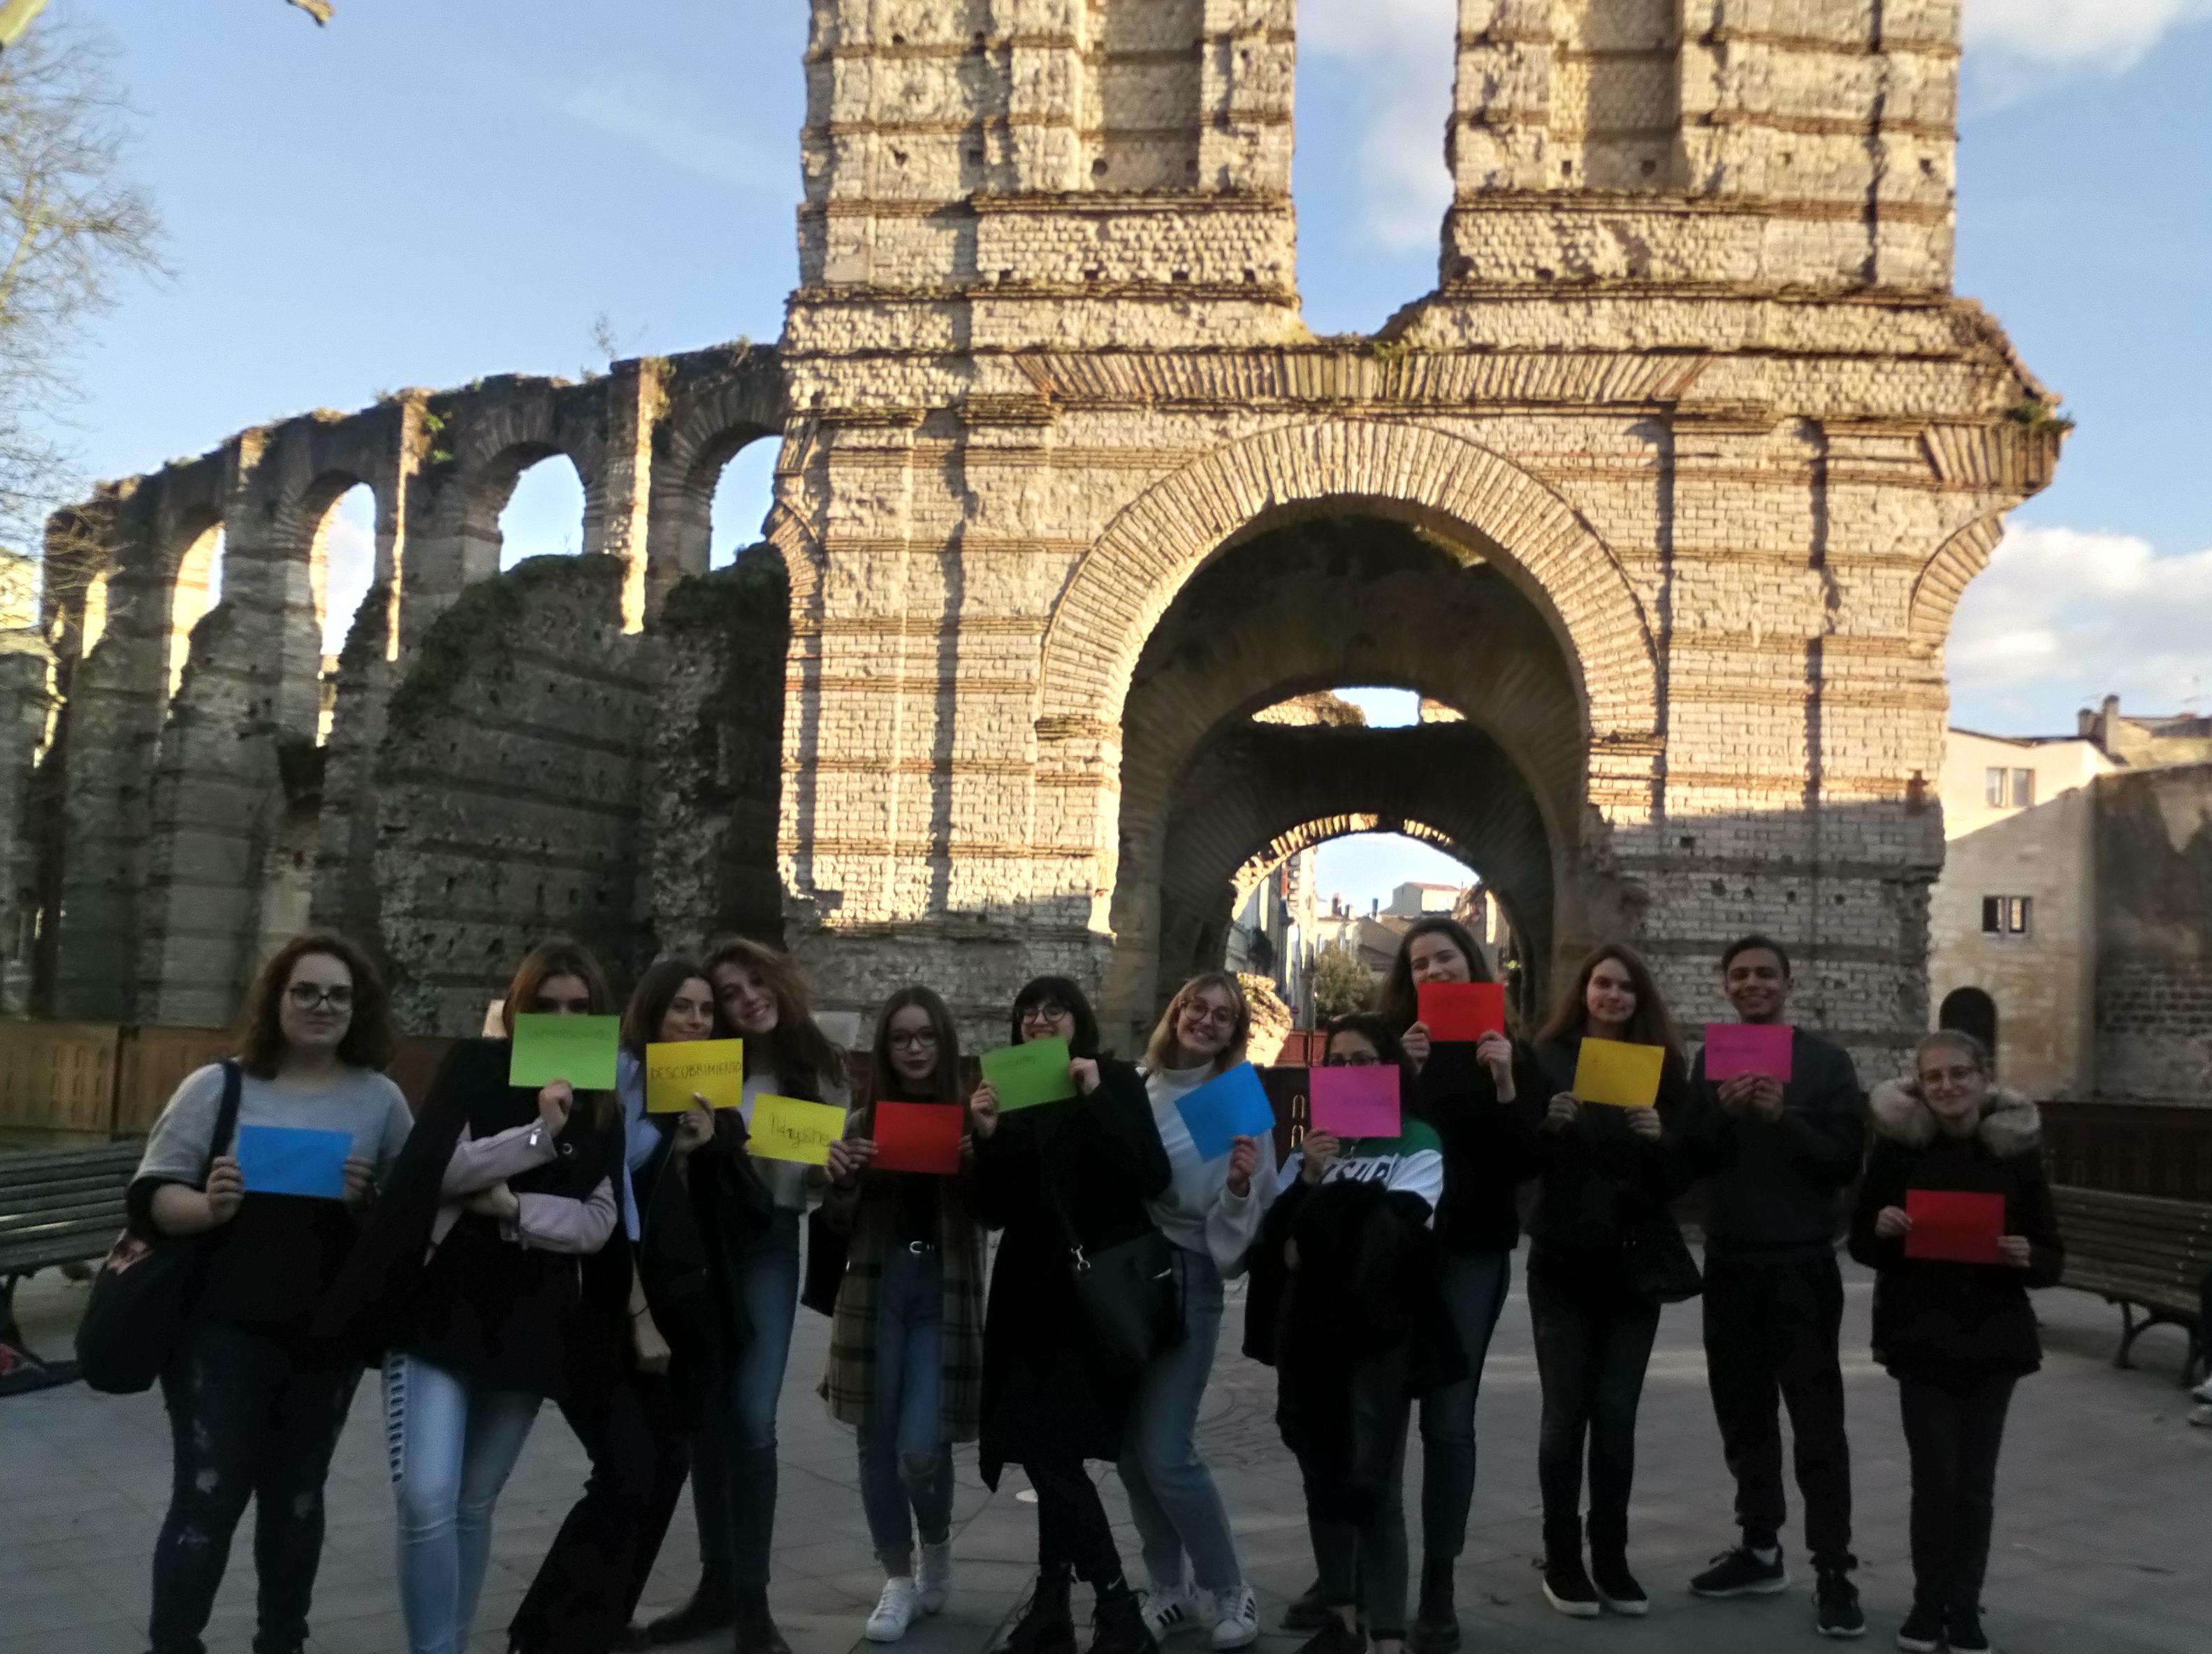 francophonie journée internationale bordeaux odyssée italiens italie europe erasmus